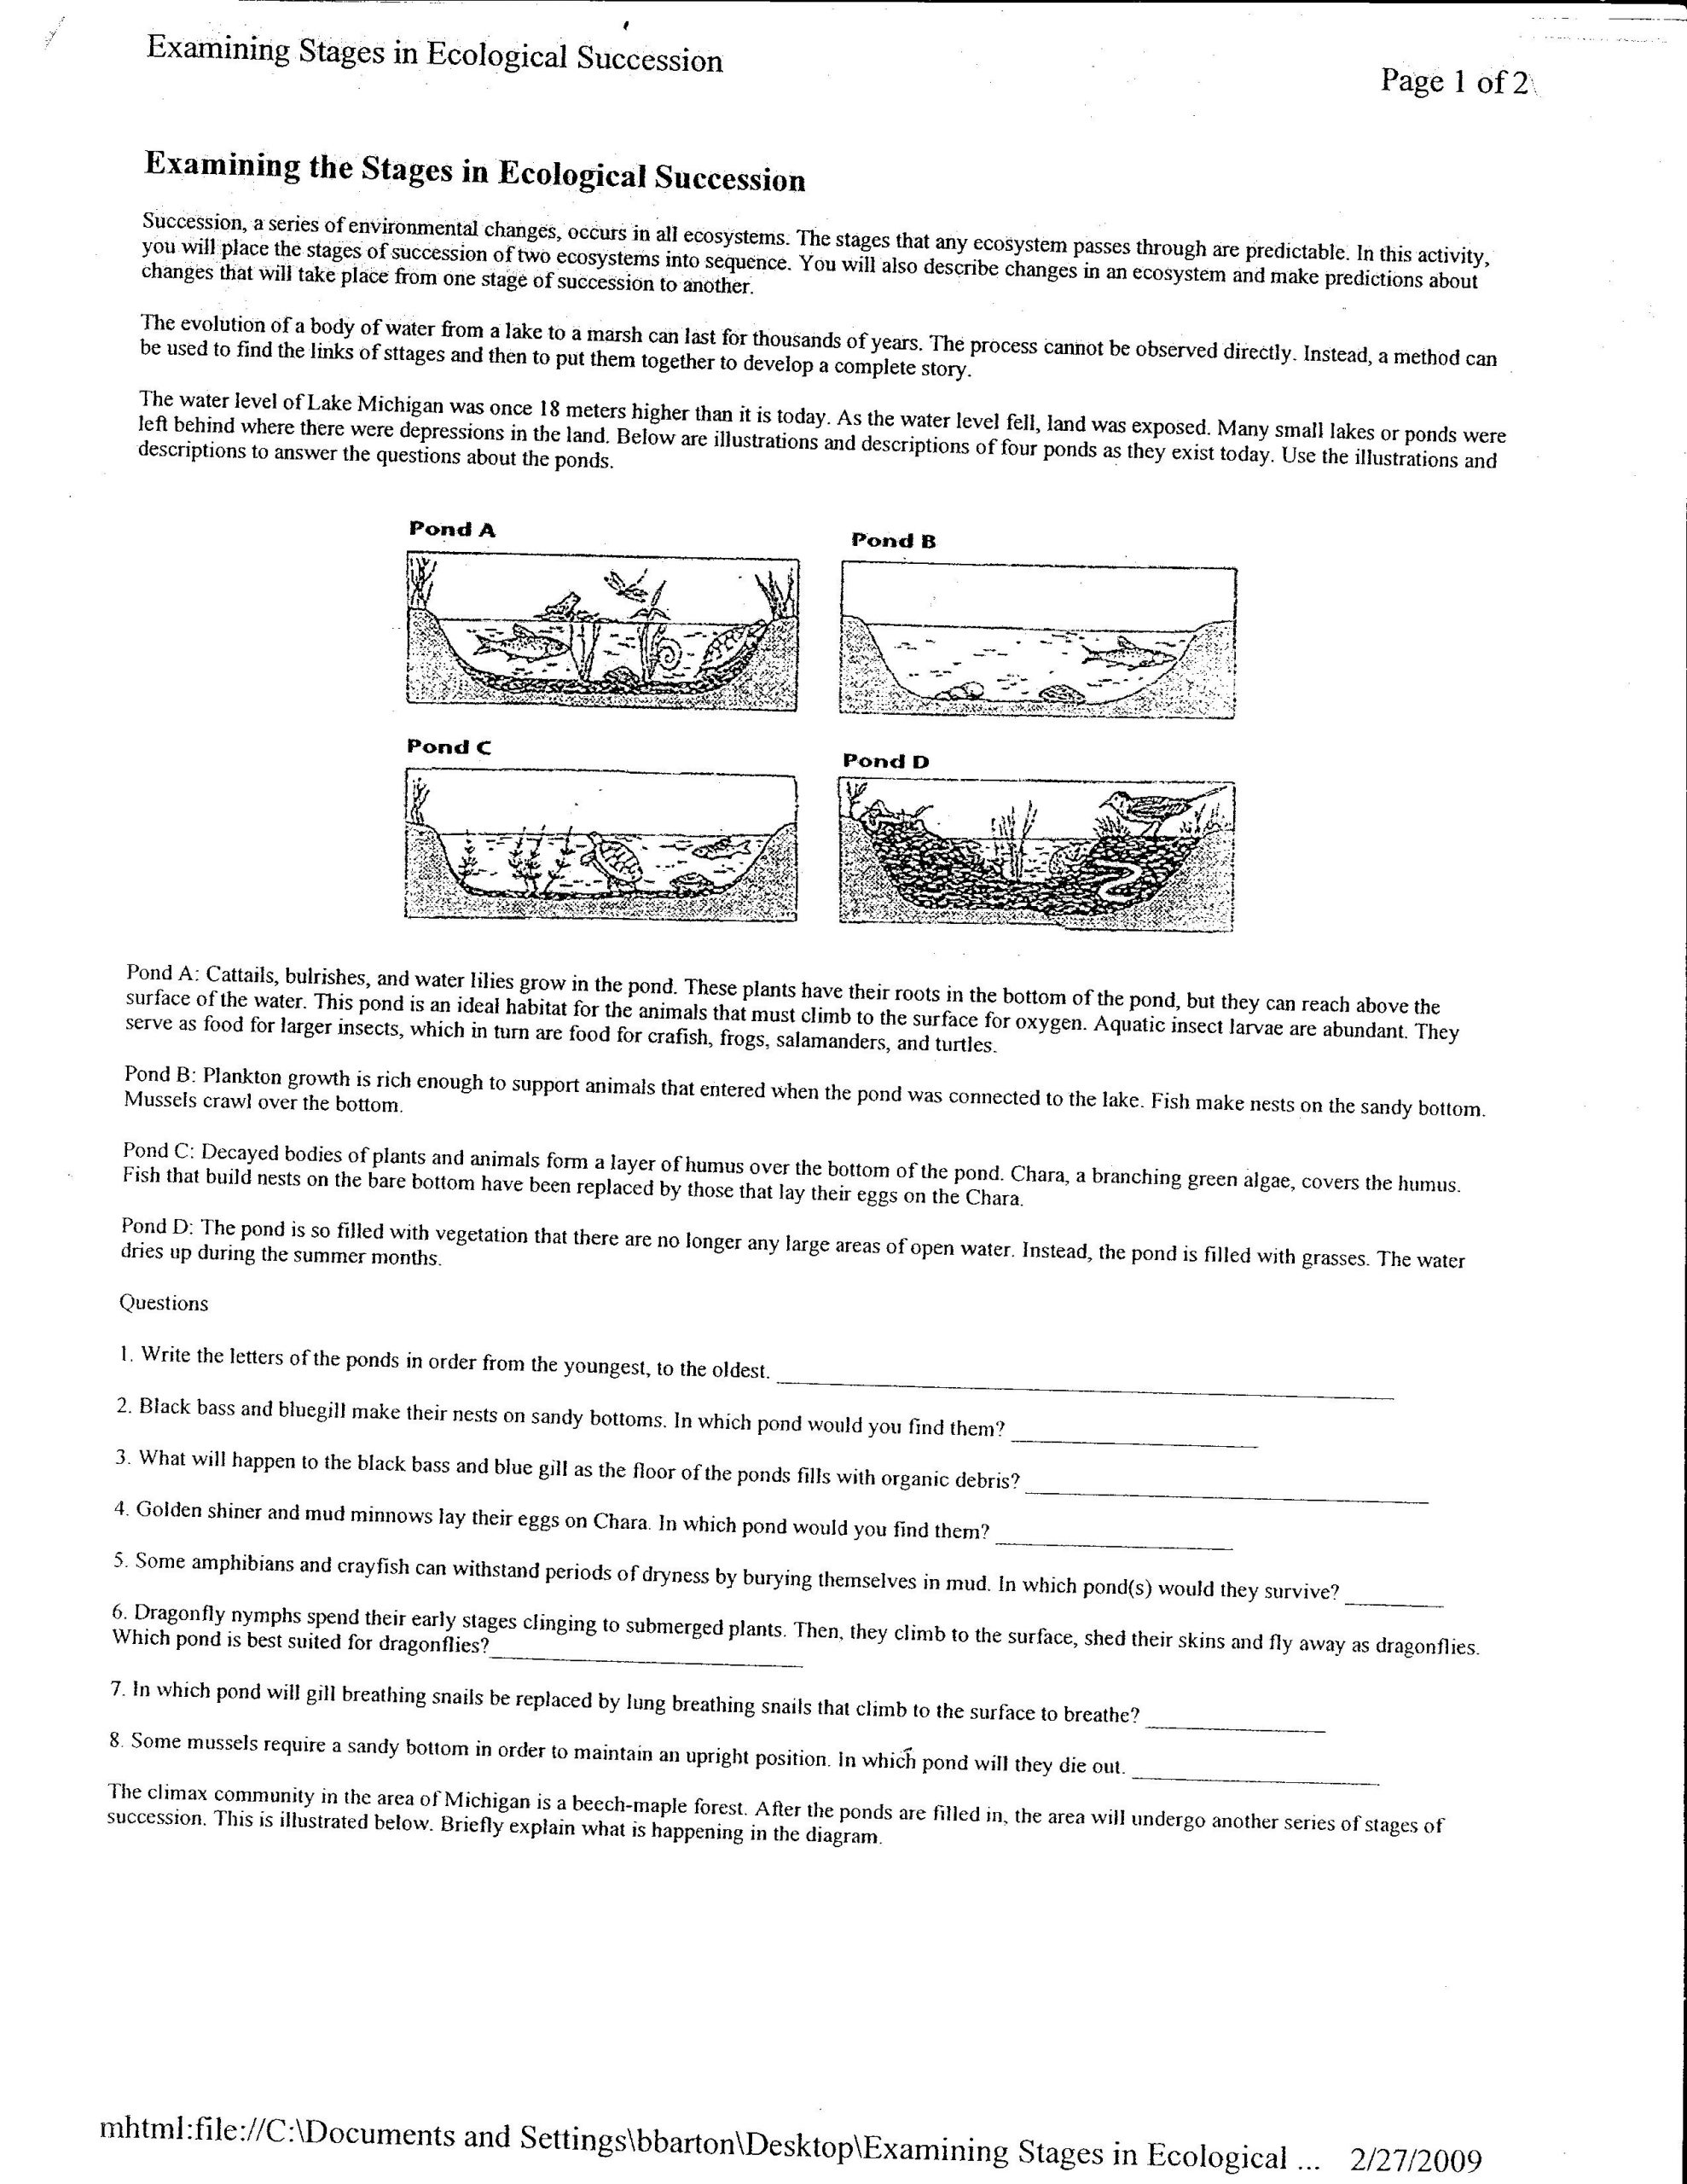 30 Ecological Succession Worksheet Answer Key | Education ...